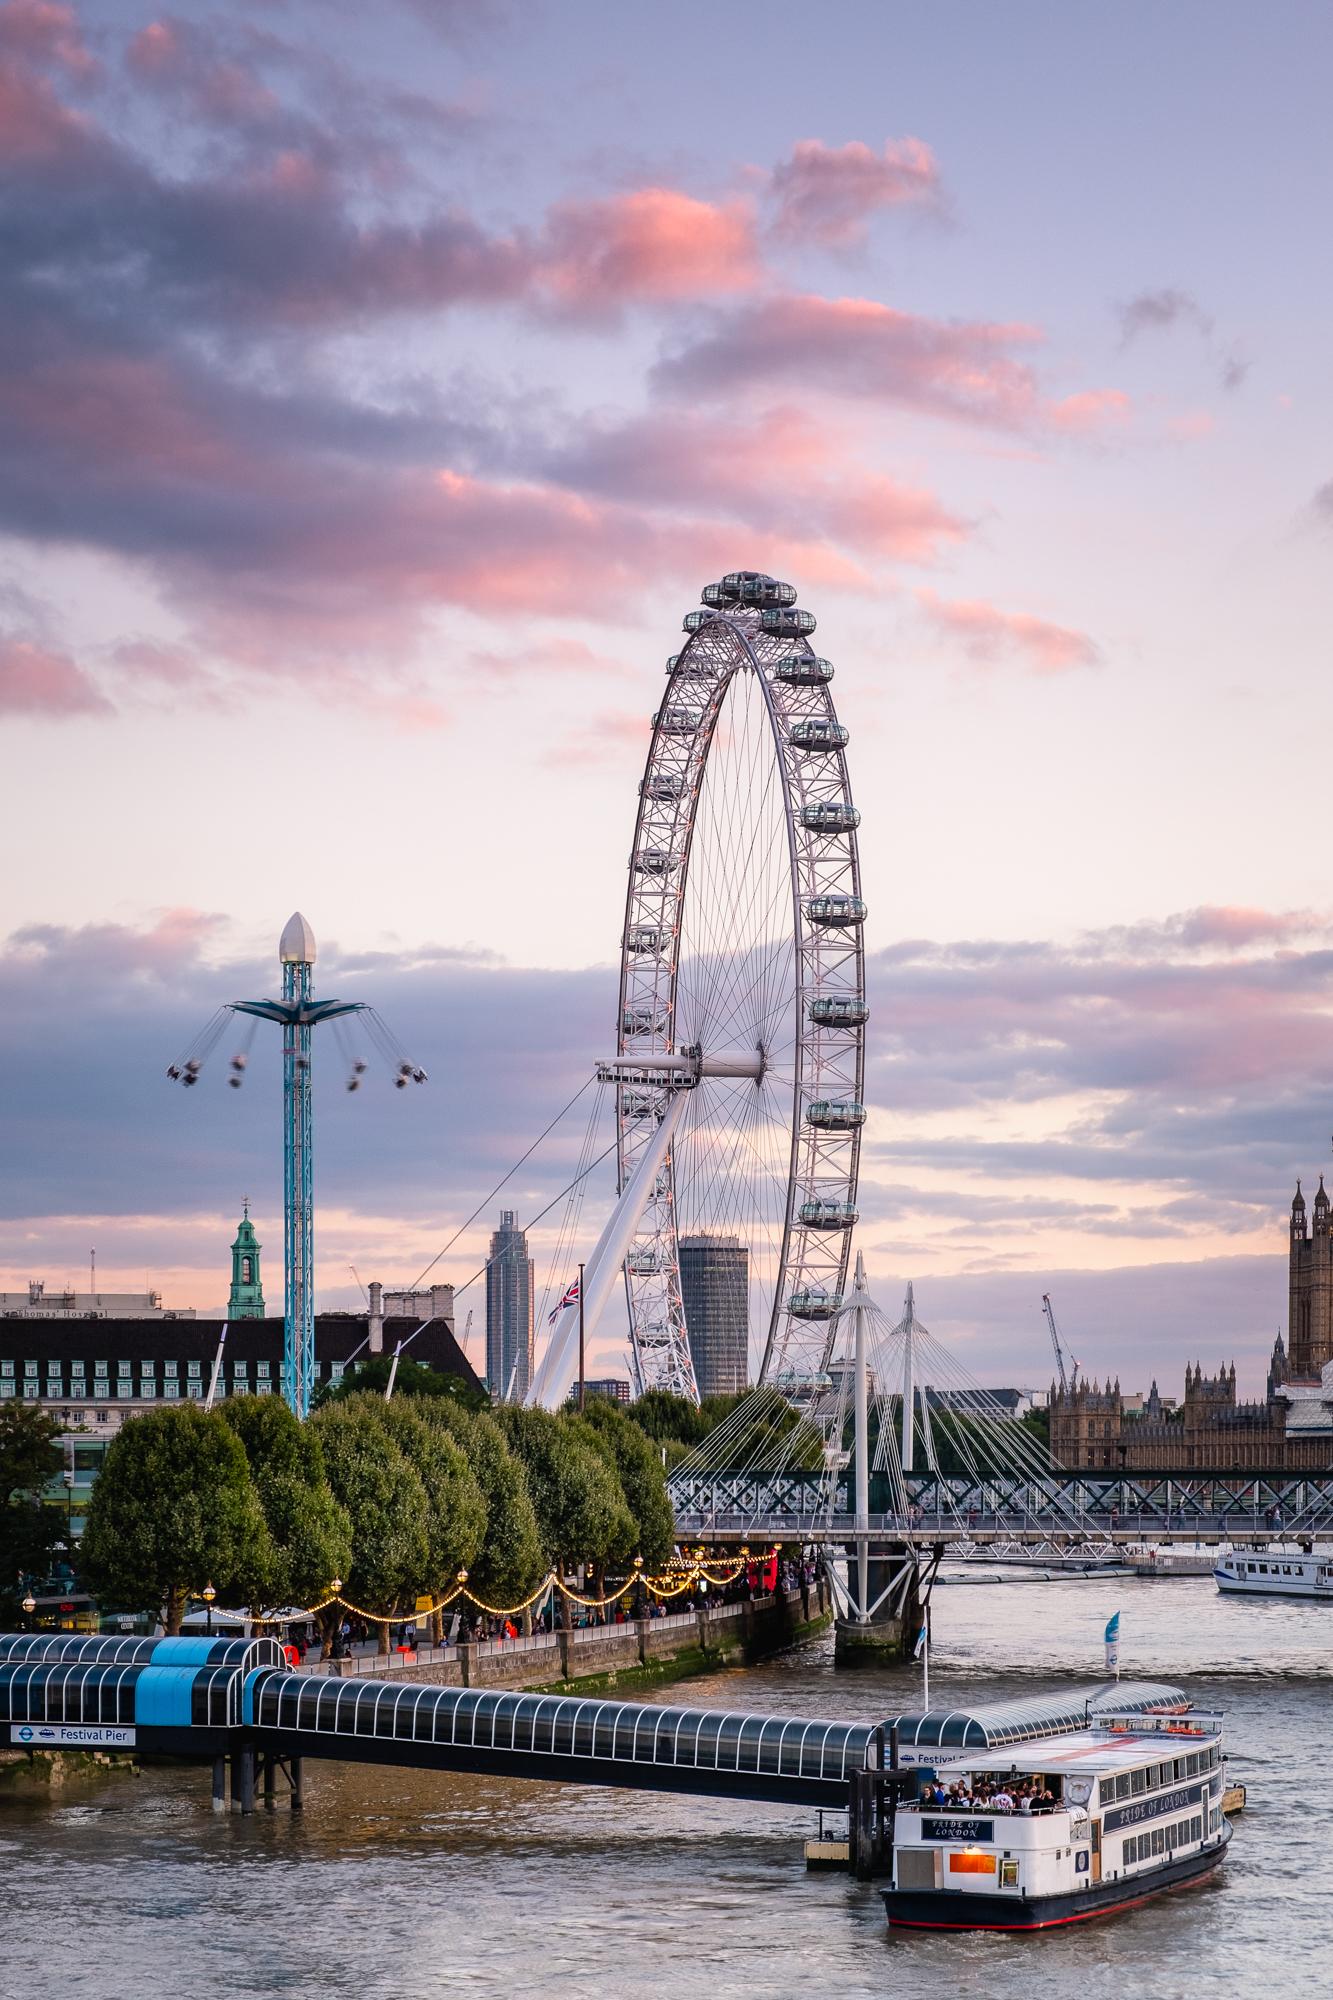 180913 - London - Sunset - London Eye 004.jpg